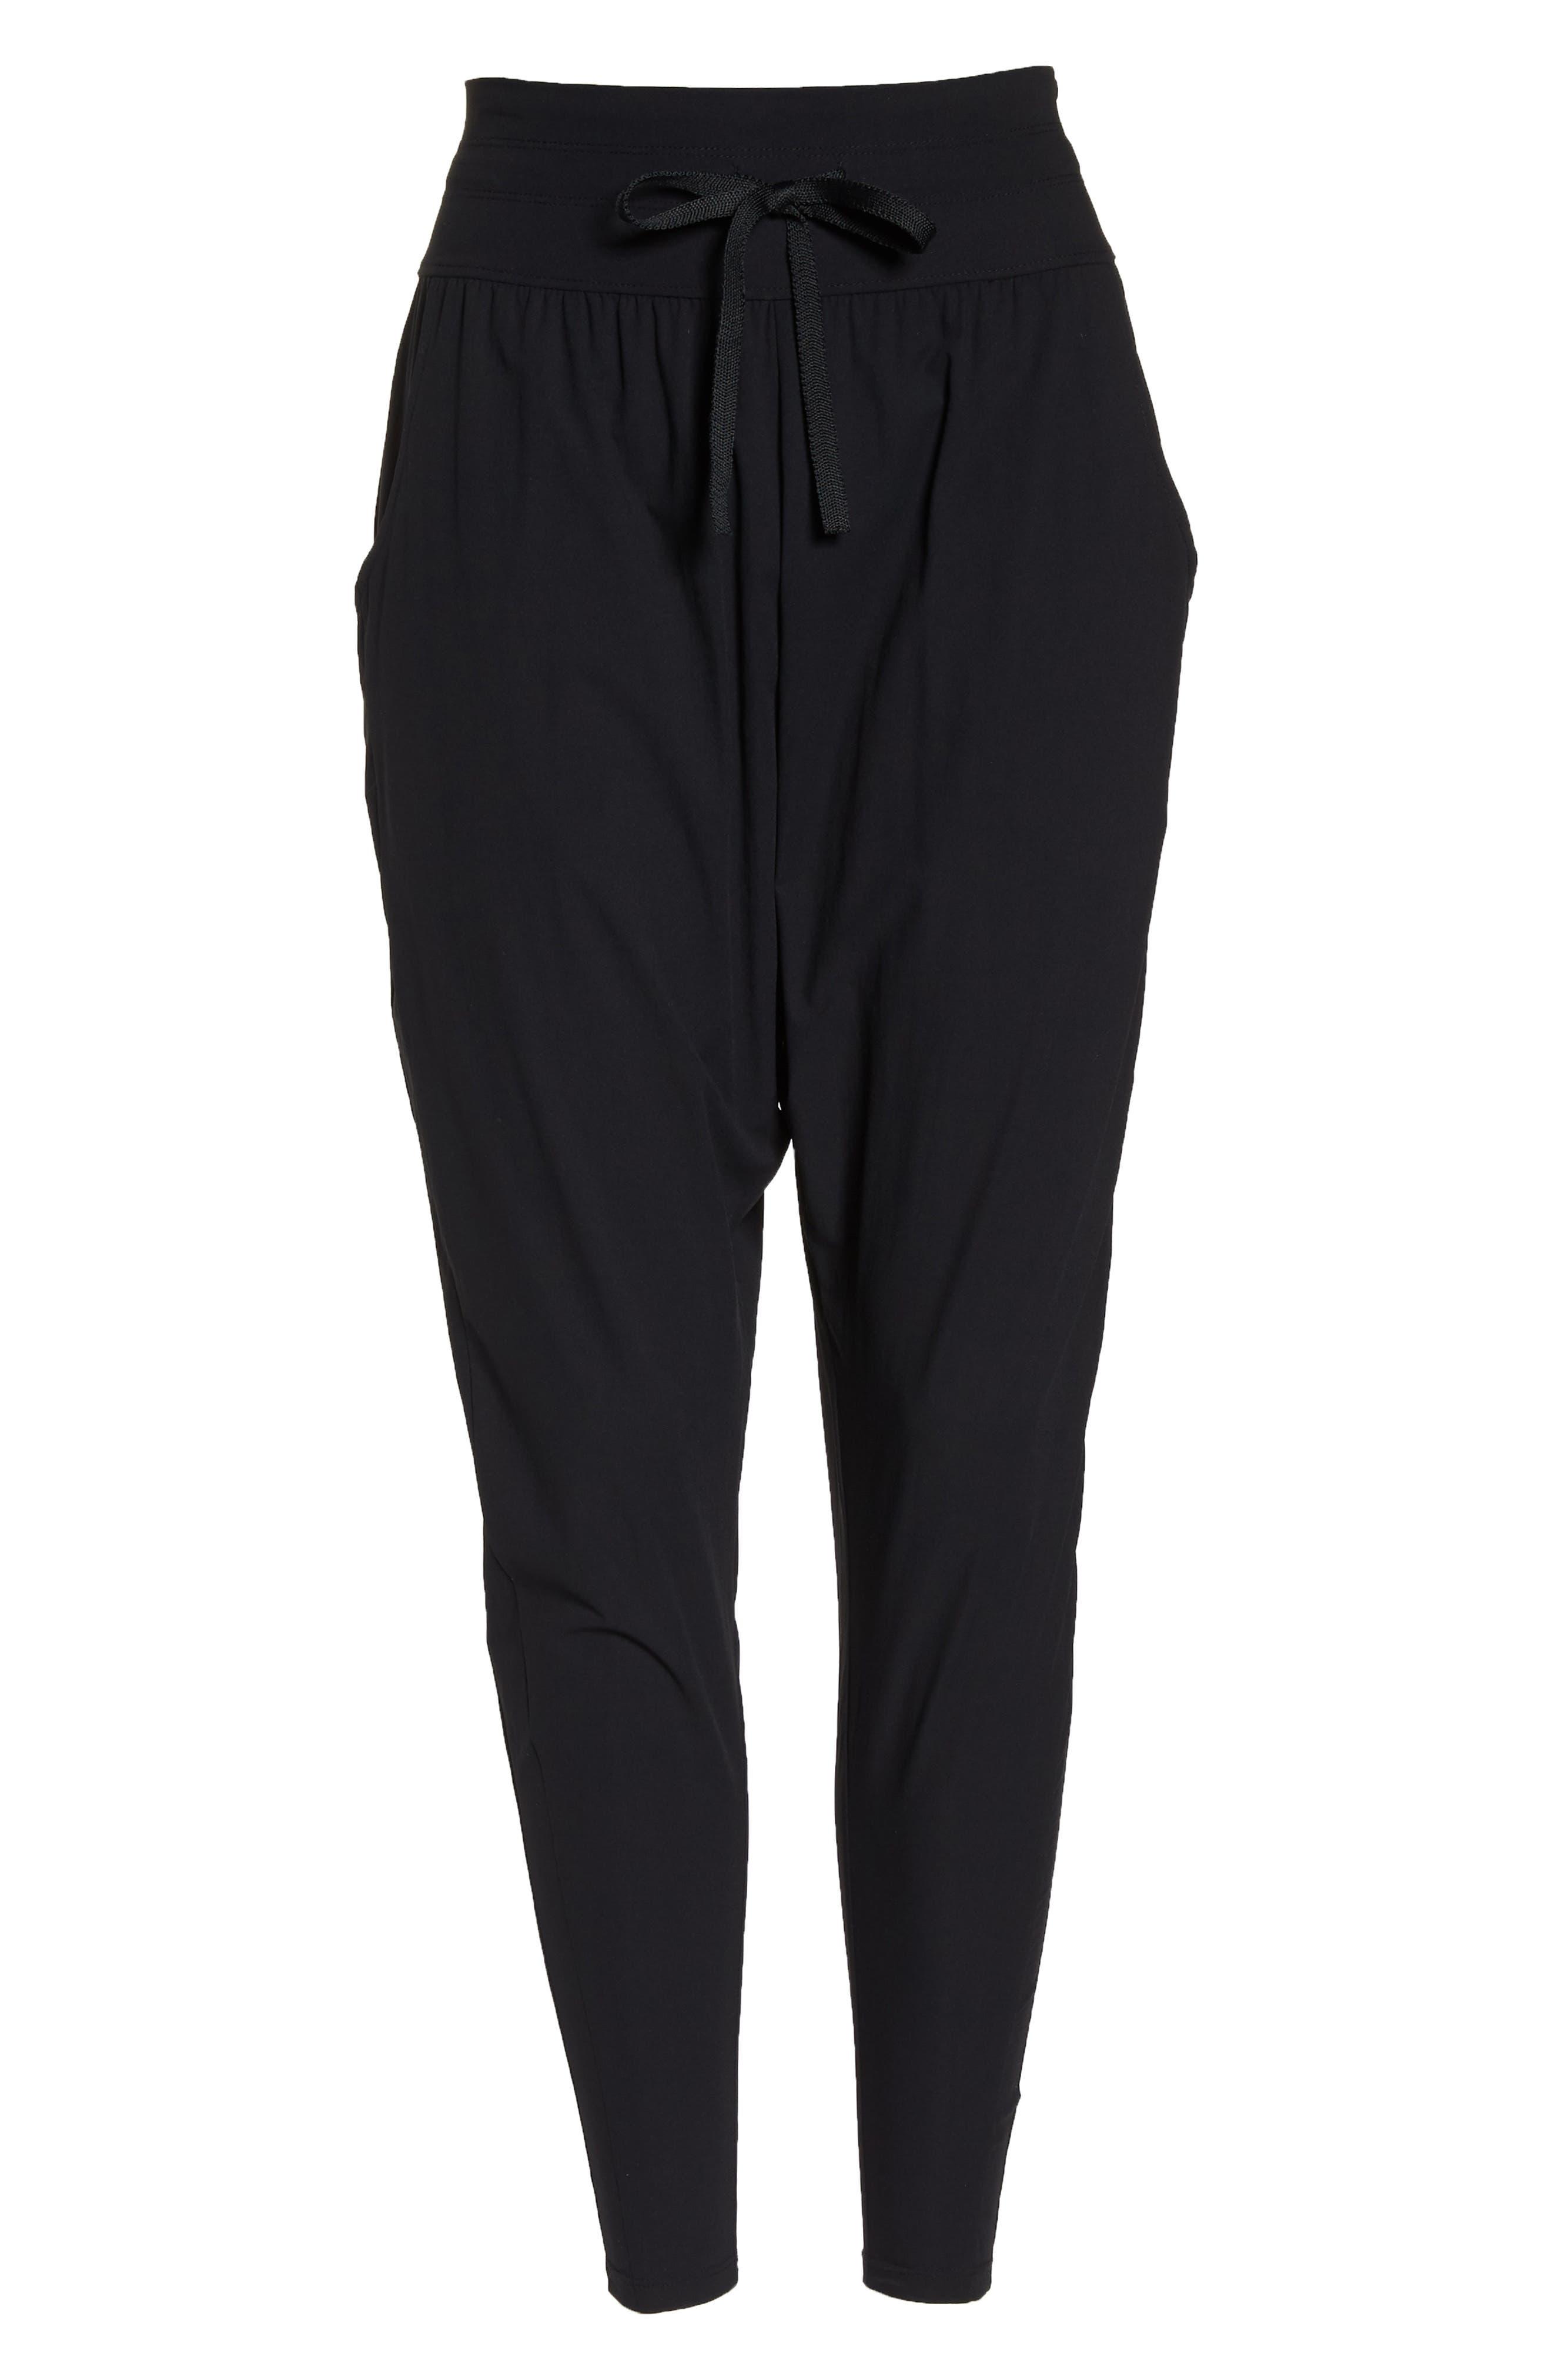 Cardio Harem Pants,                             Alternate thumbnail 7, color,                             Black